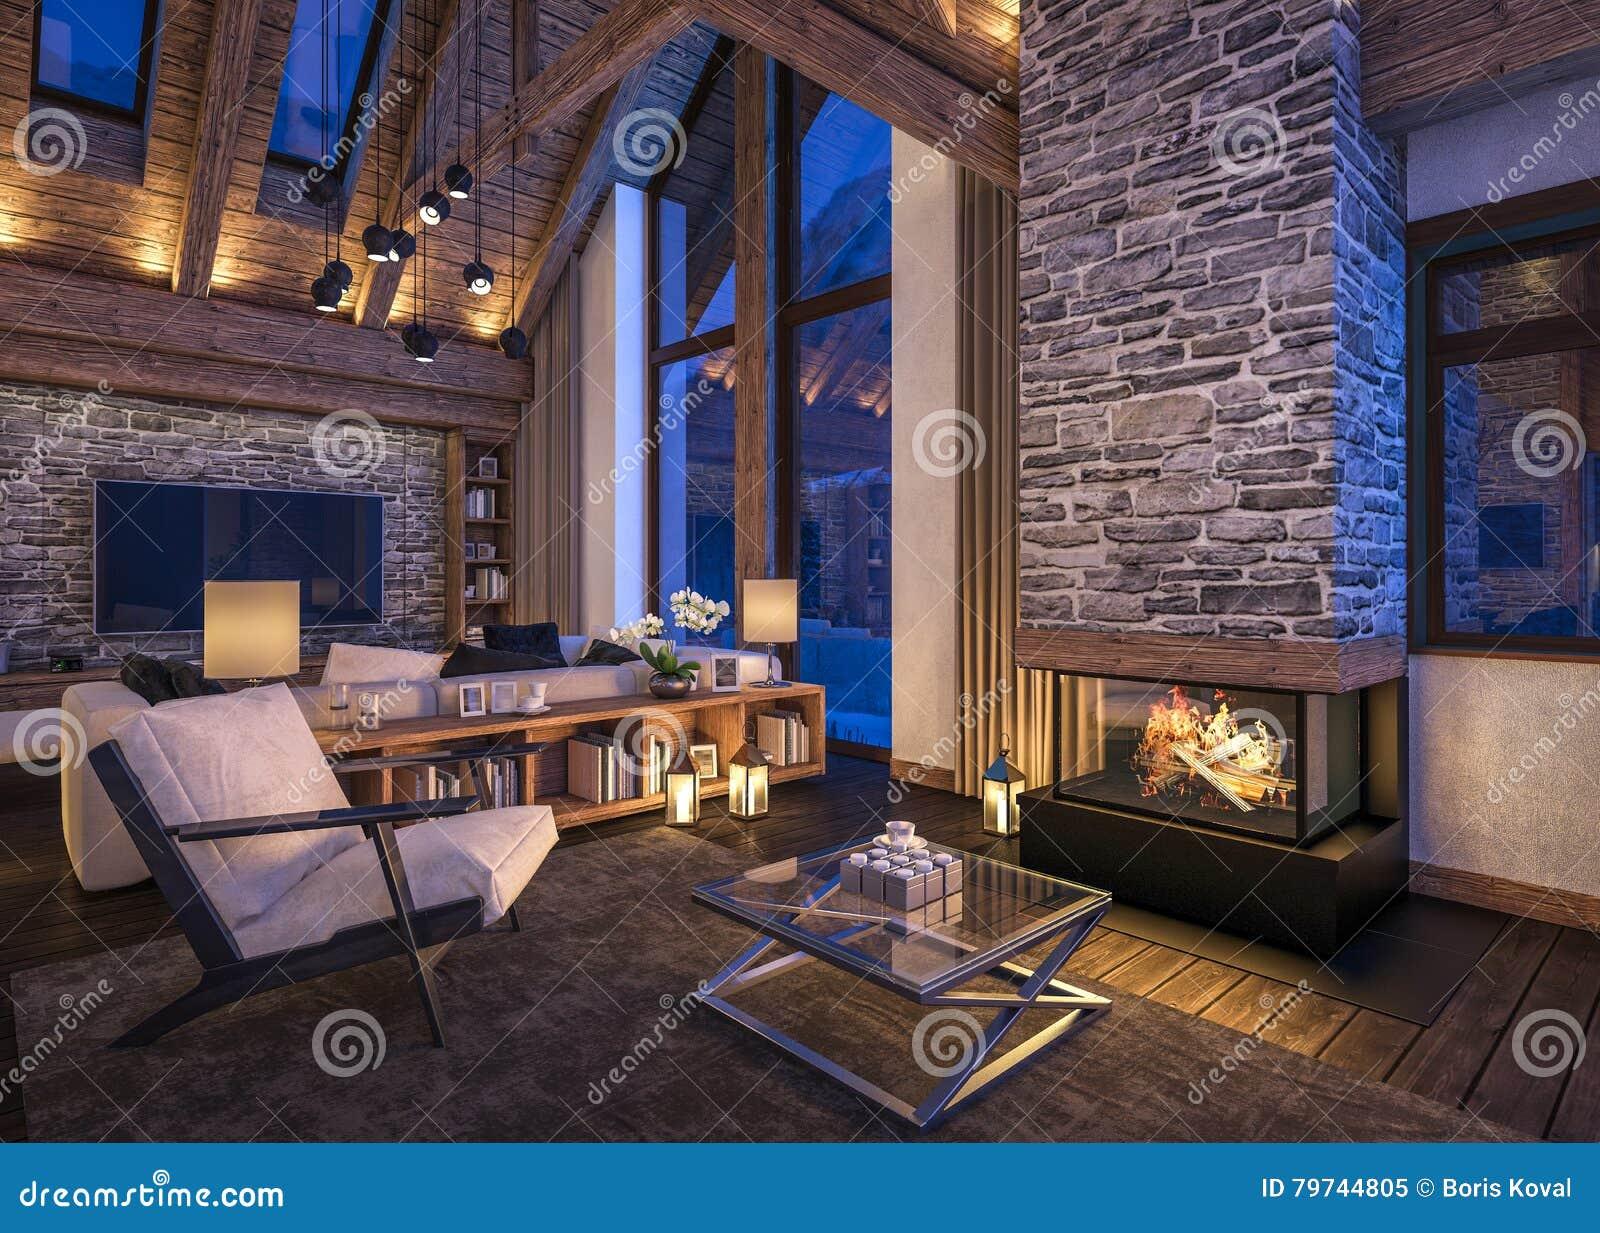 3D瑞士山中的牧人小屋晚上客厅翻译